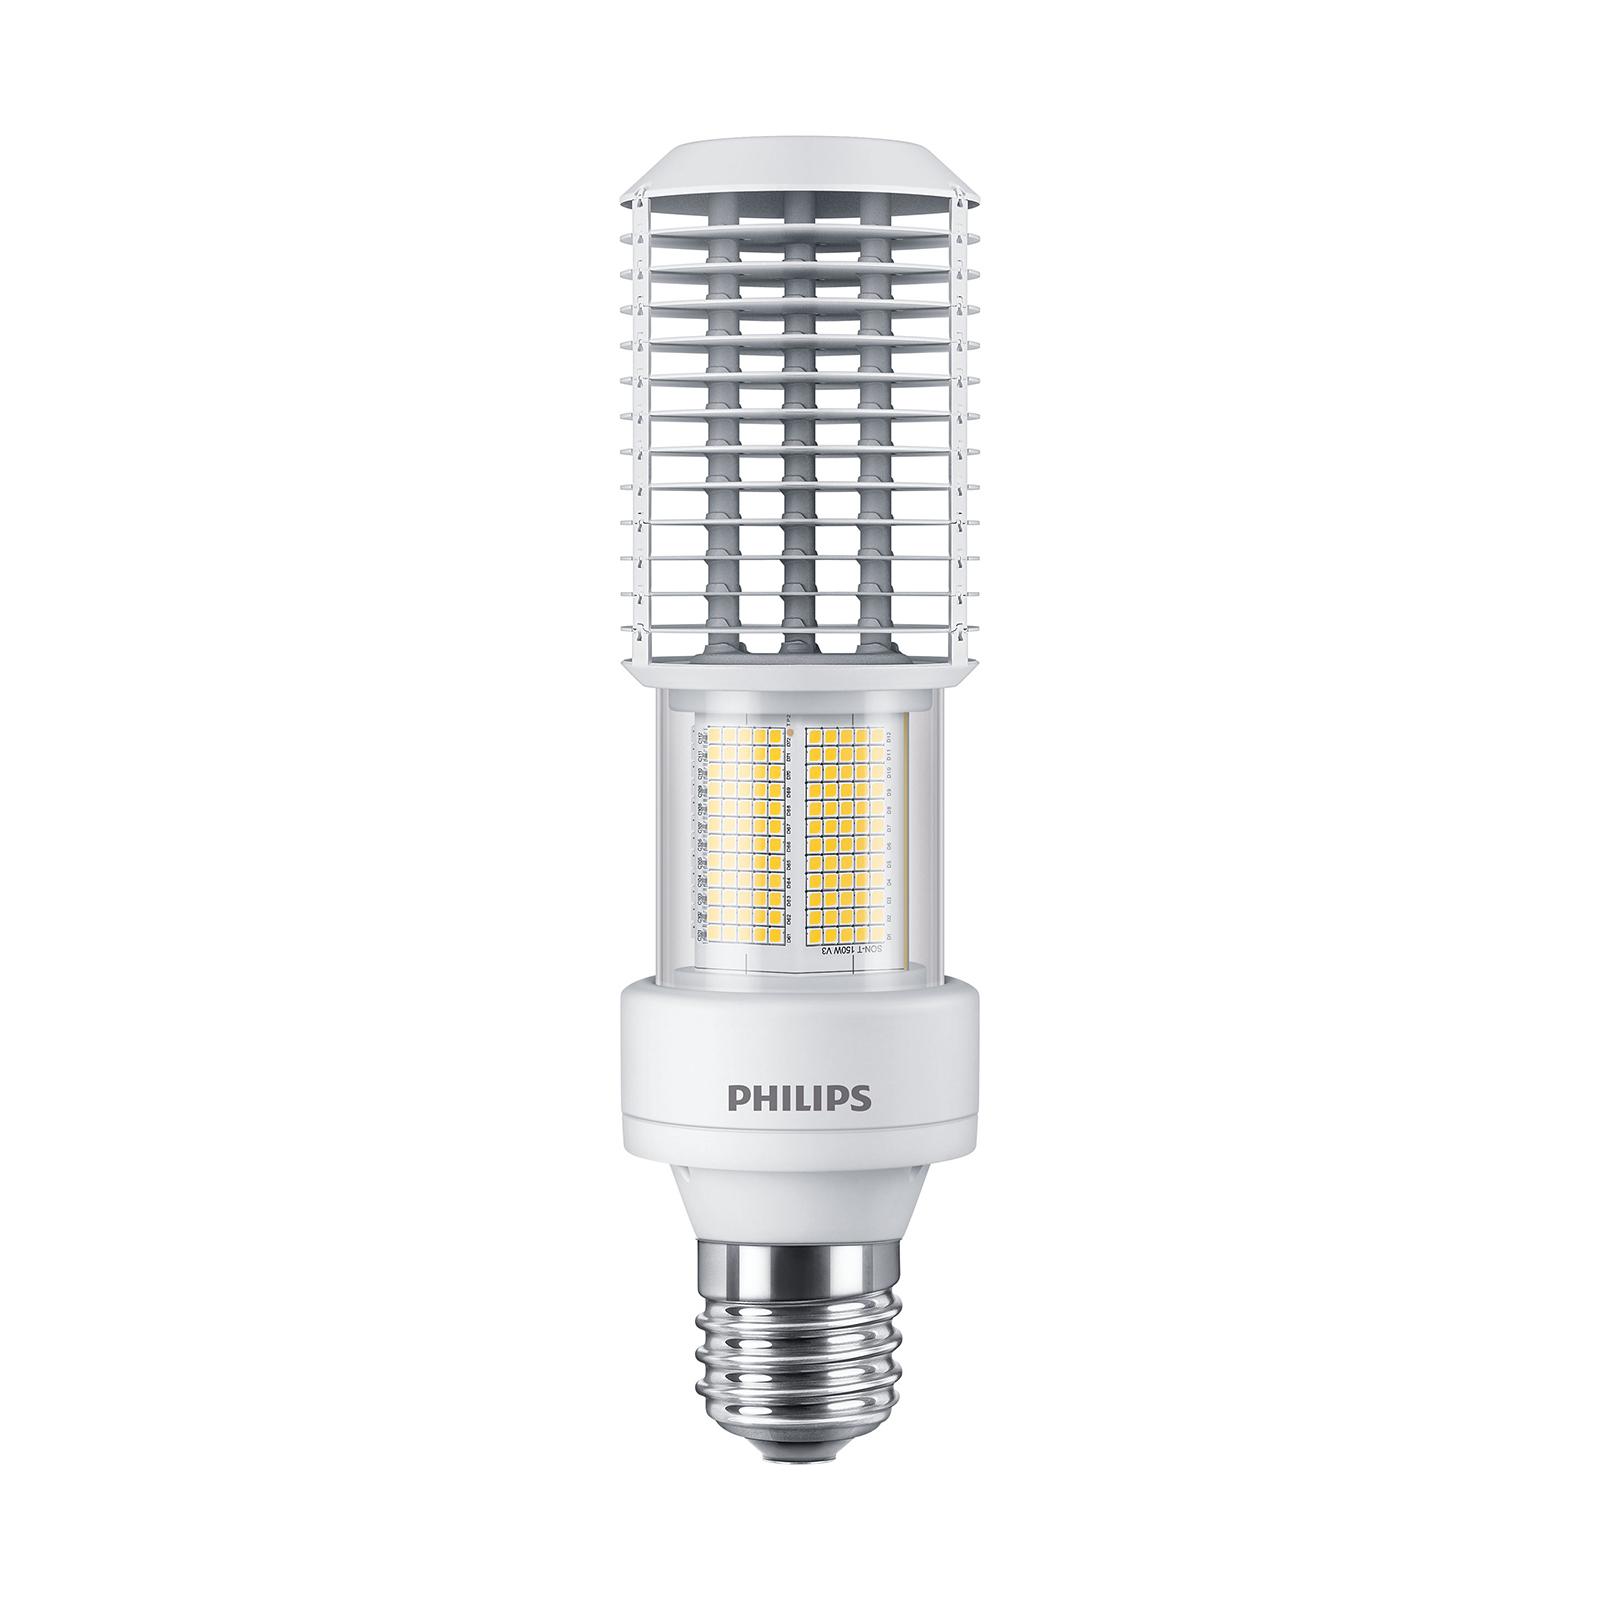 Philips E40 LED-Lampe TrueForce Road 120 68W 740